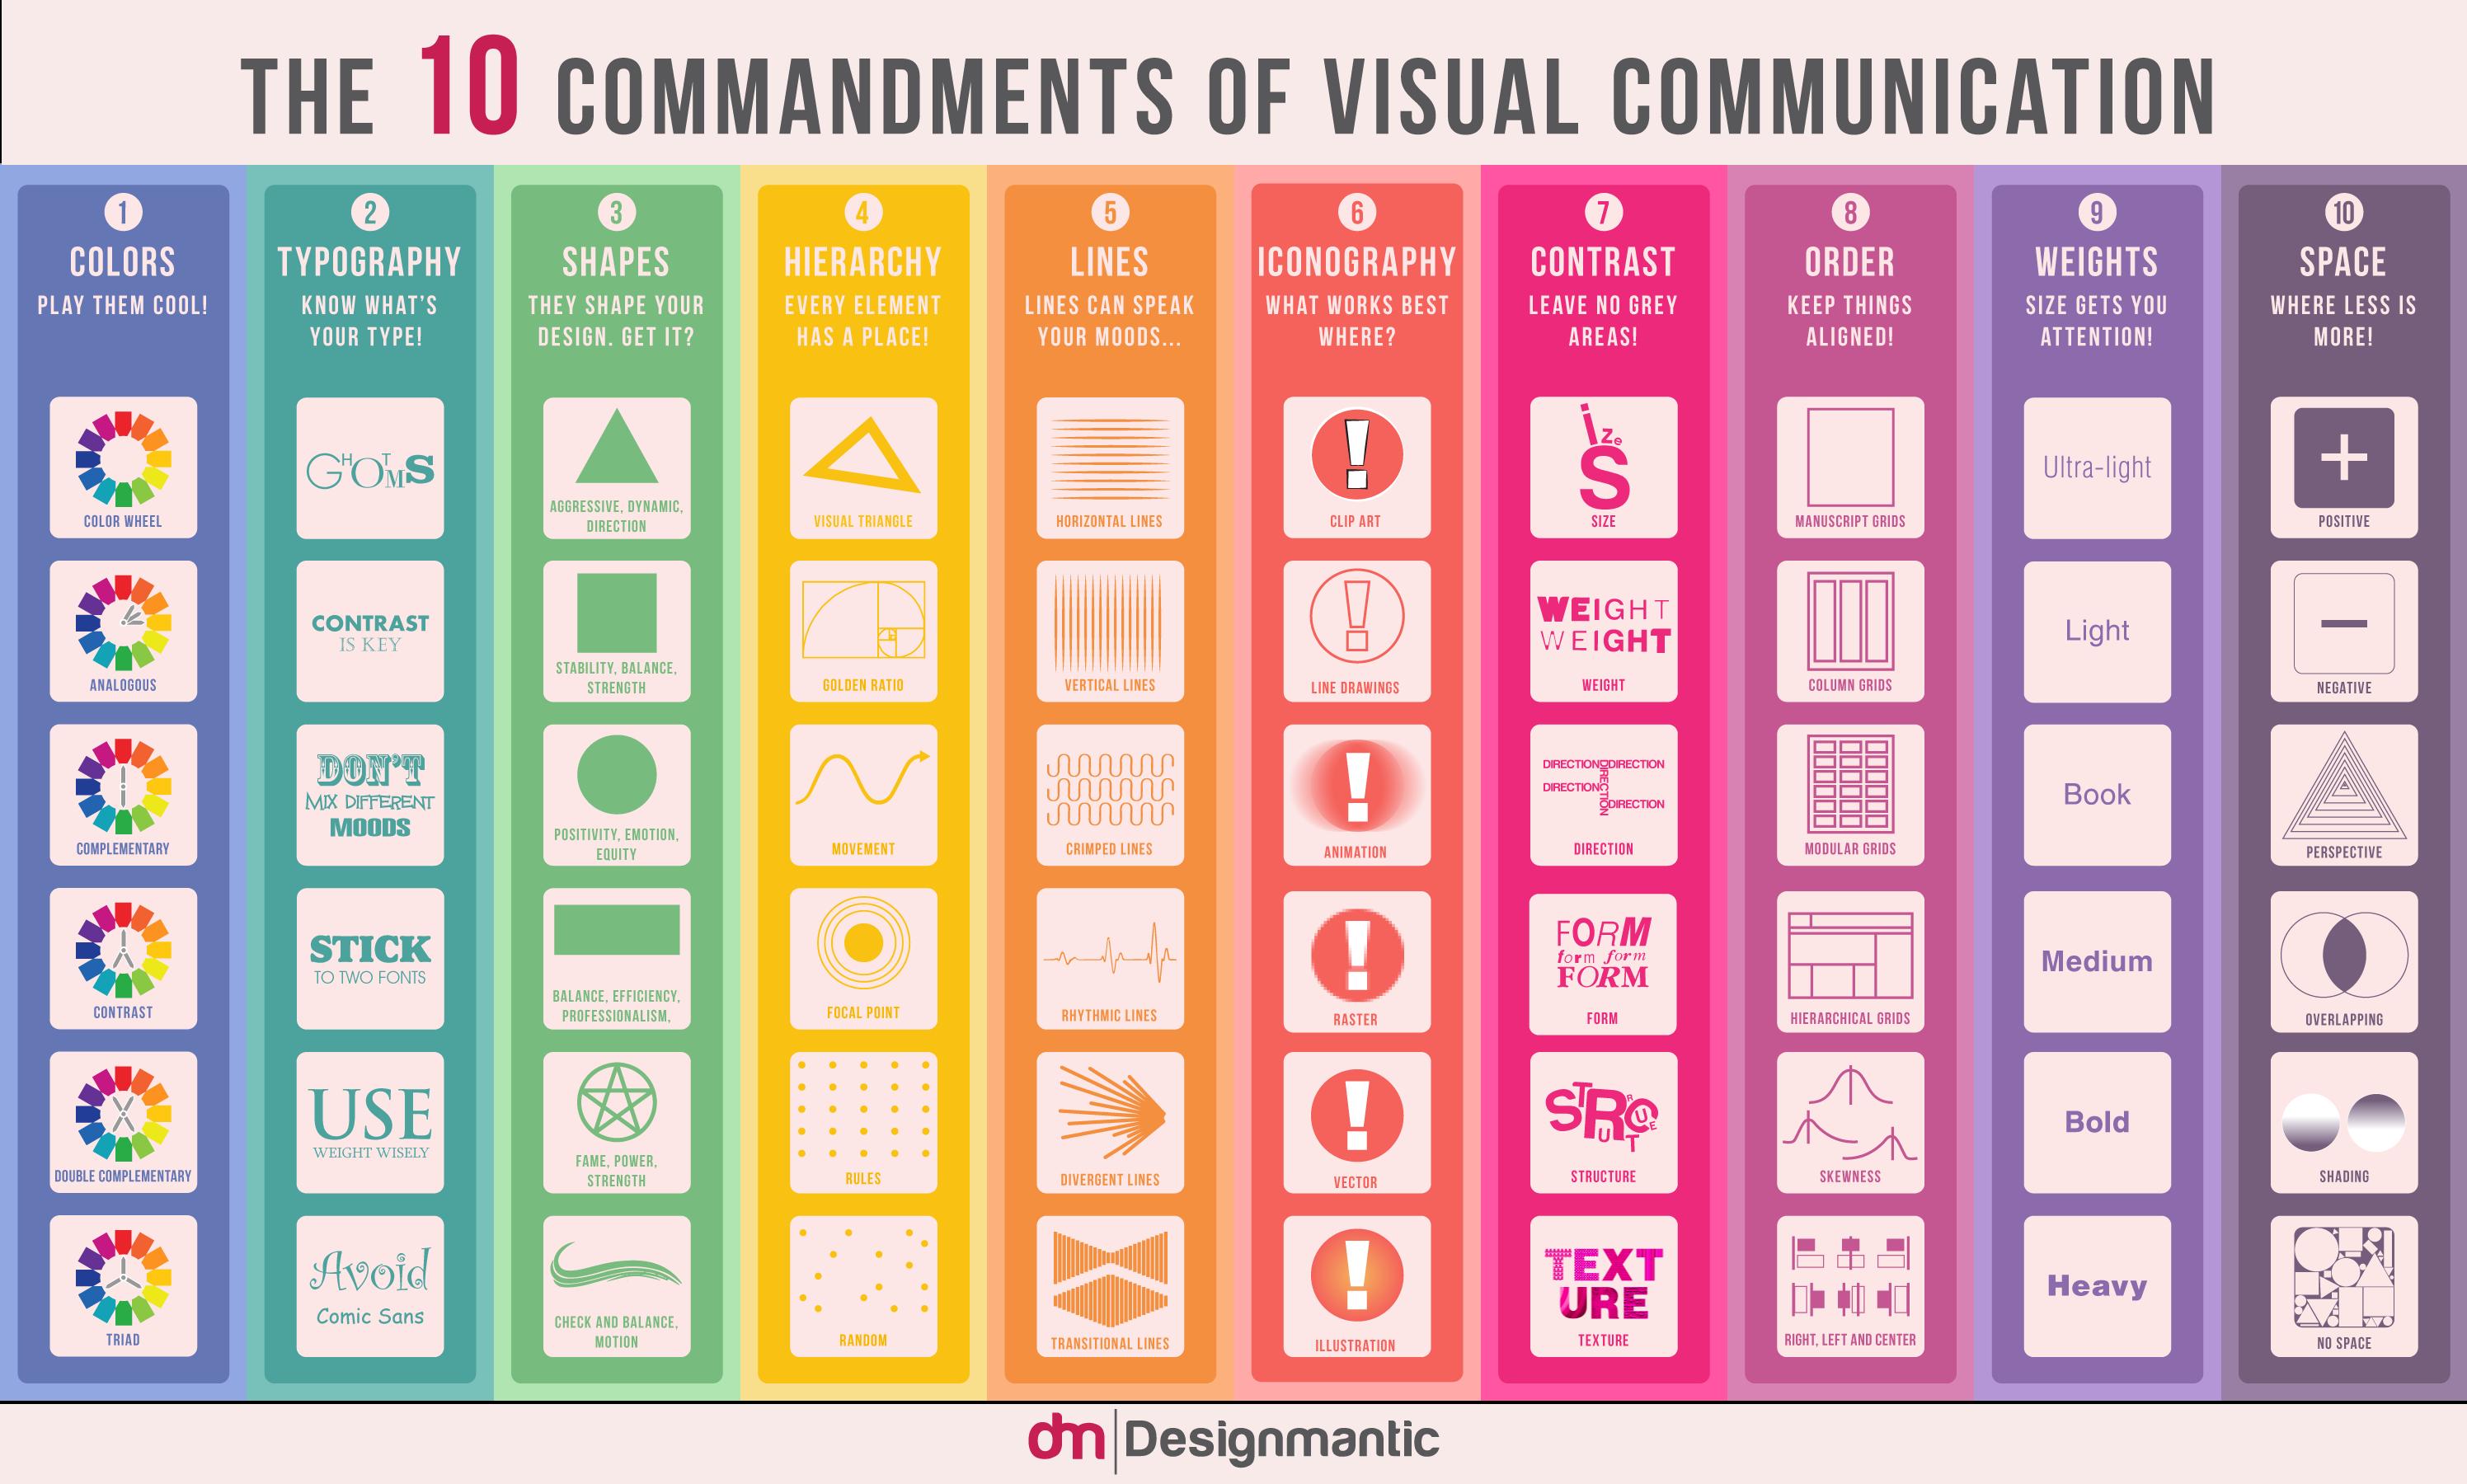 The 10 Commandments of Visual Communication